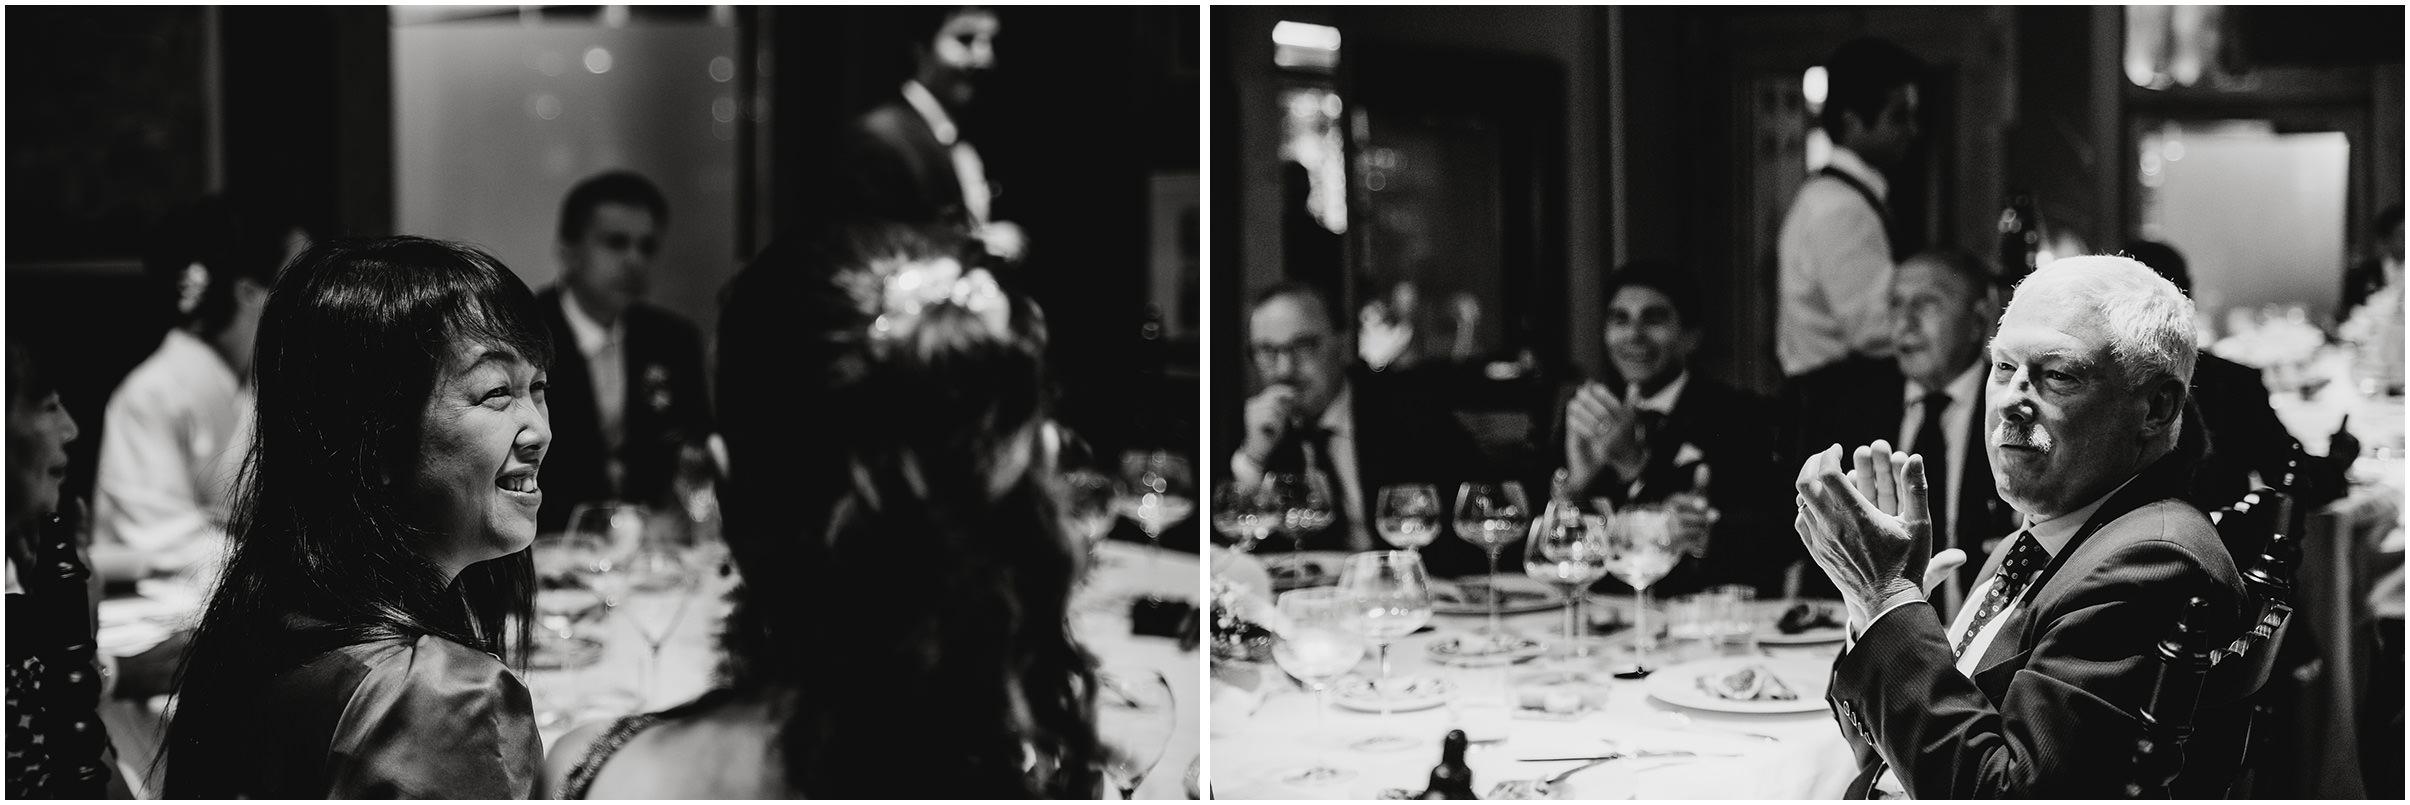 WEDDING-PHOTOGRAPHY-SARA-LORENZONI-FOTOGRAFIA-MATRIMONIO-ORVIETO-JUKA-ANTONELLO57